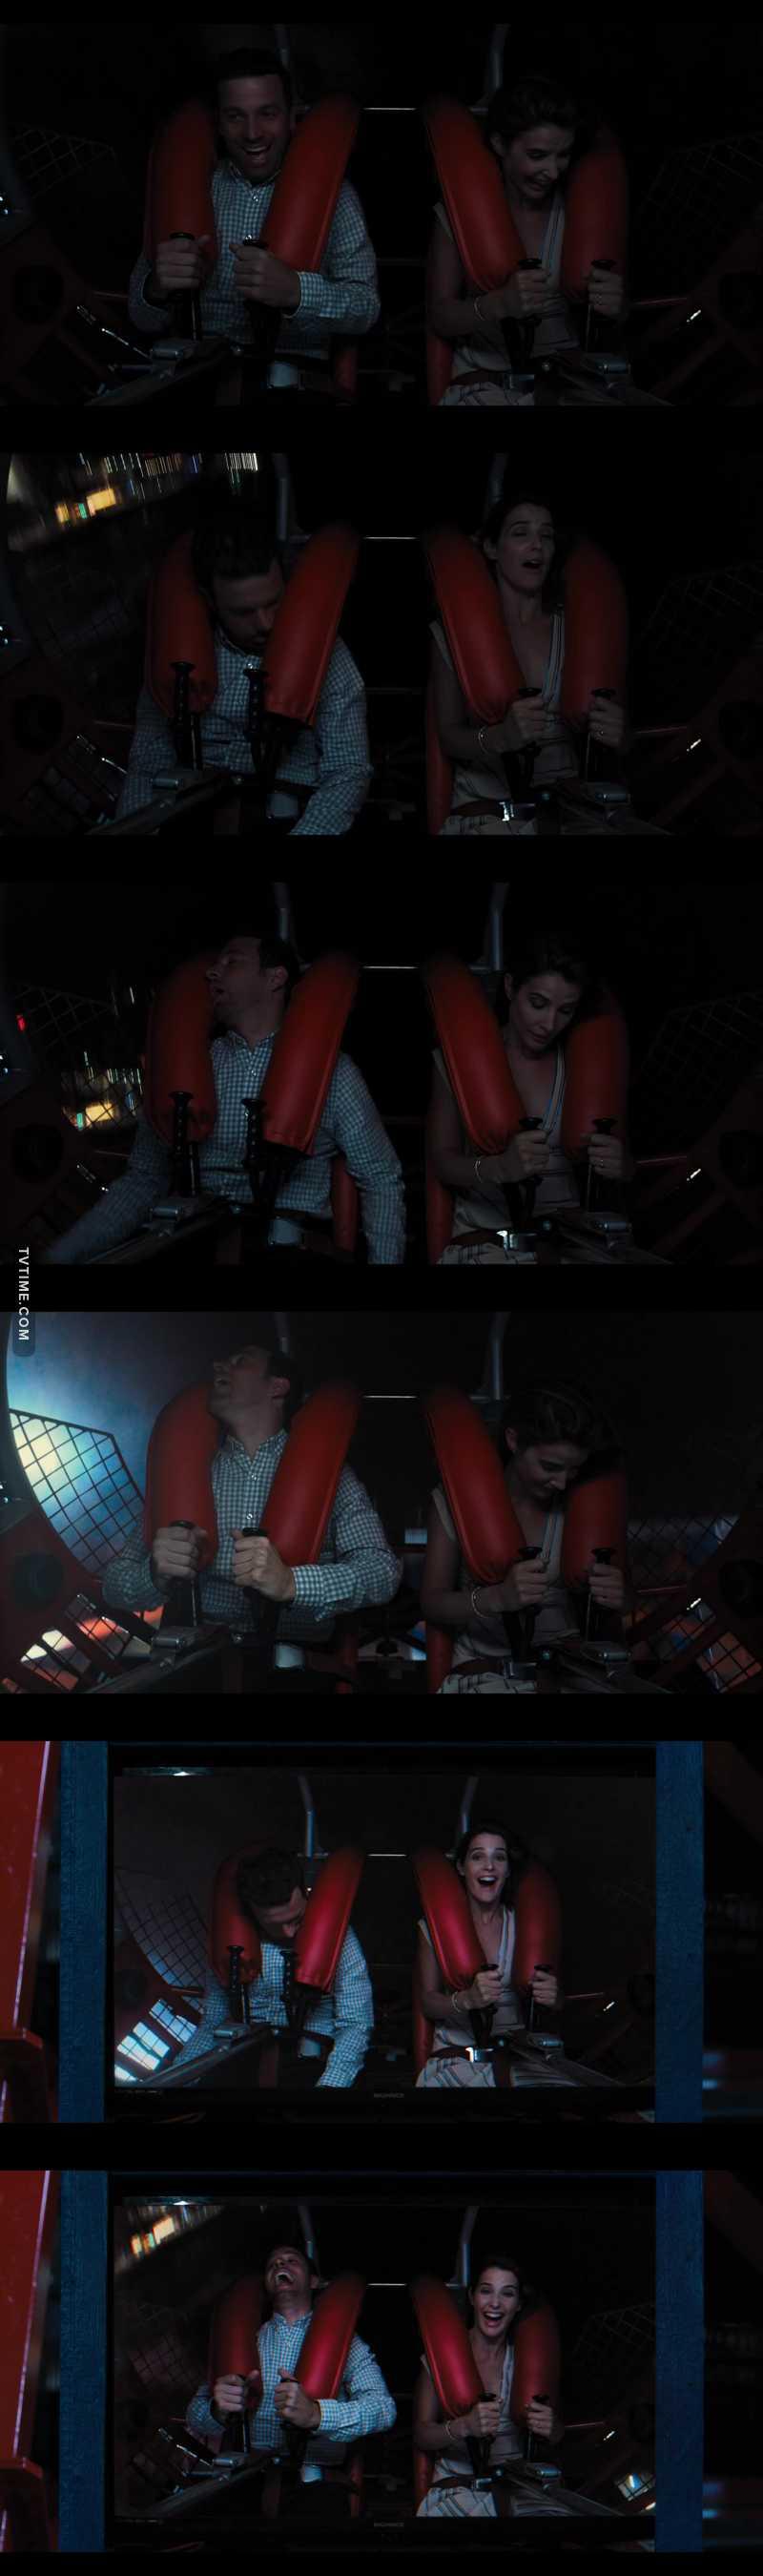 This scene has me in tears 🤣🤣🤣🤣😂😂😂😂😂